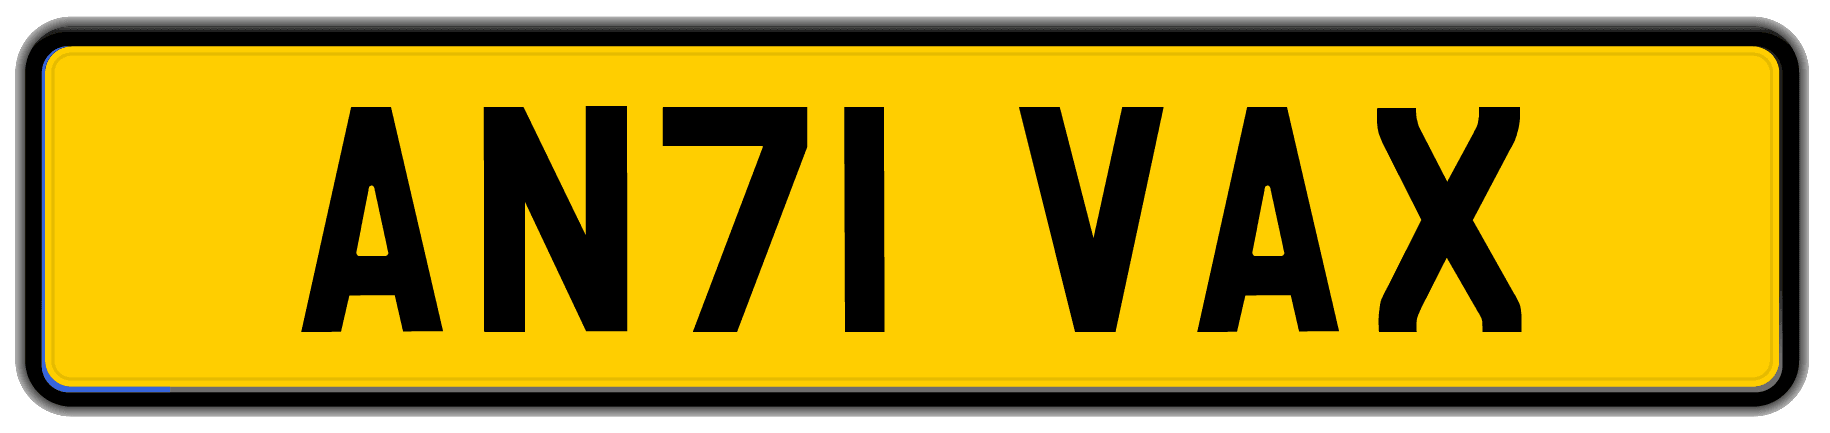 Anti VaX plate